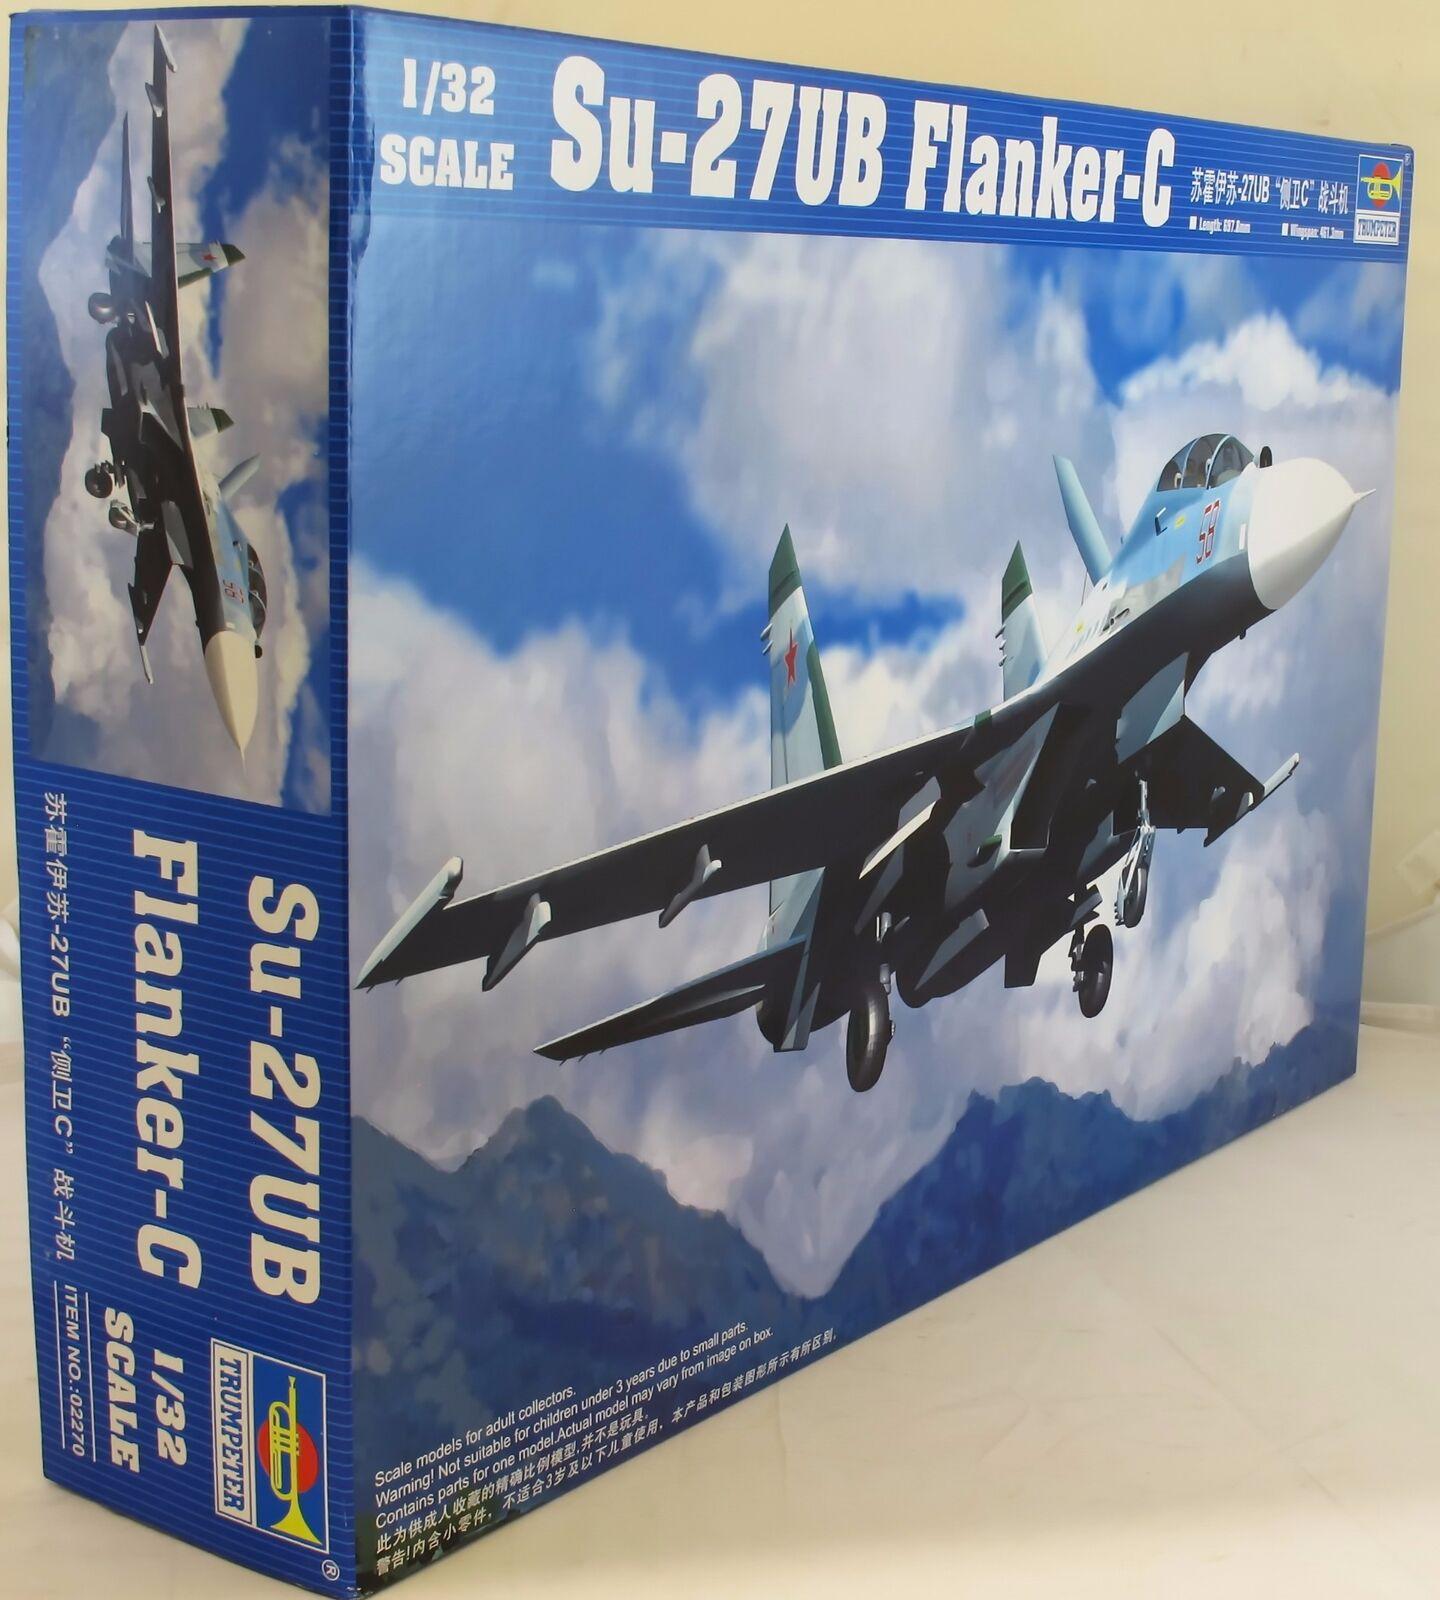 Trumpeter 1 32 02270 Sukhoi Su-27UB Flanker C Model Aircraft Kit